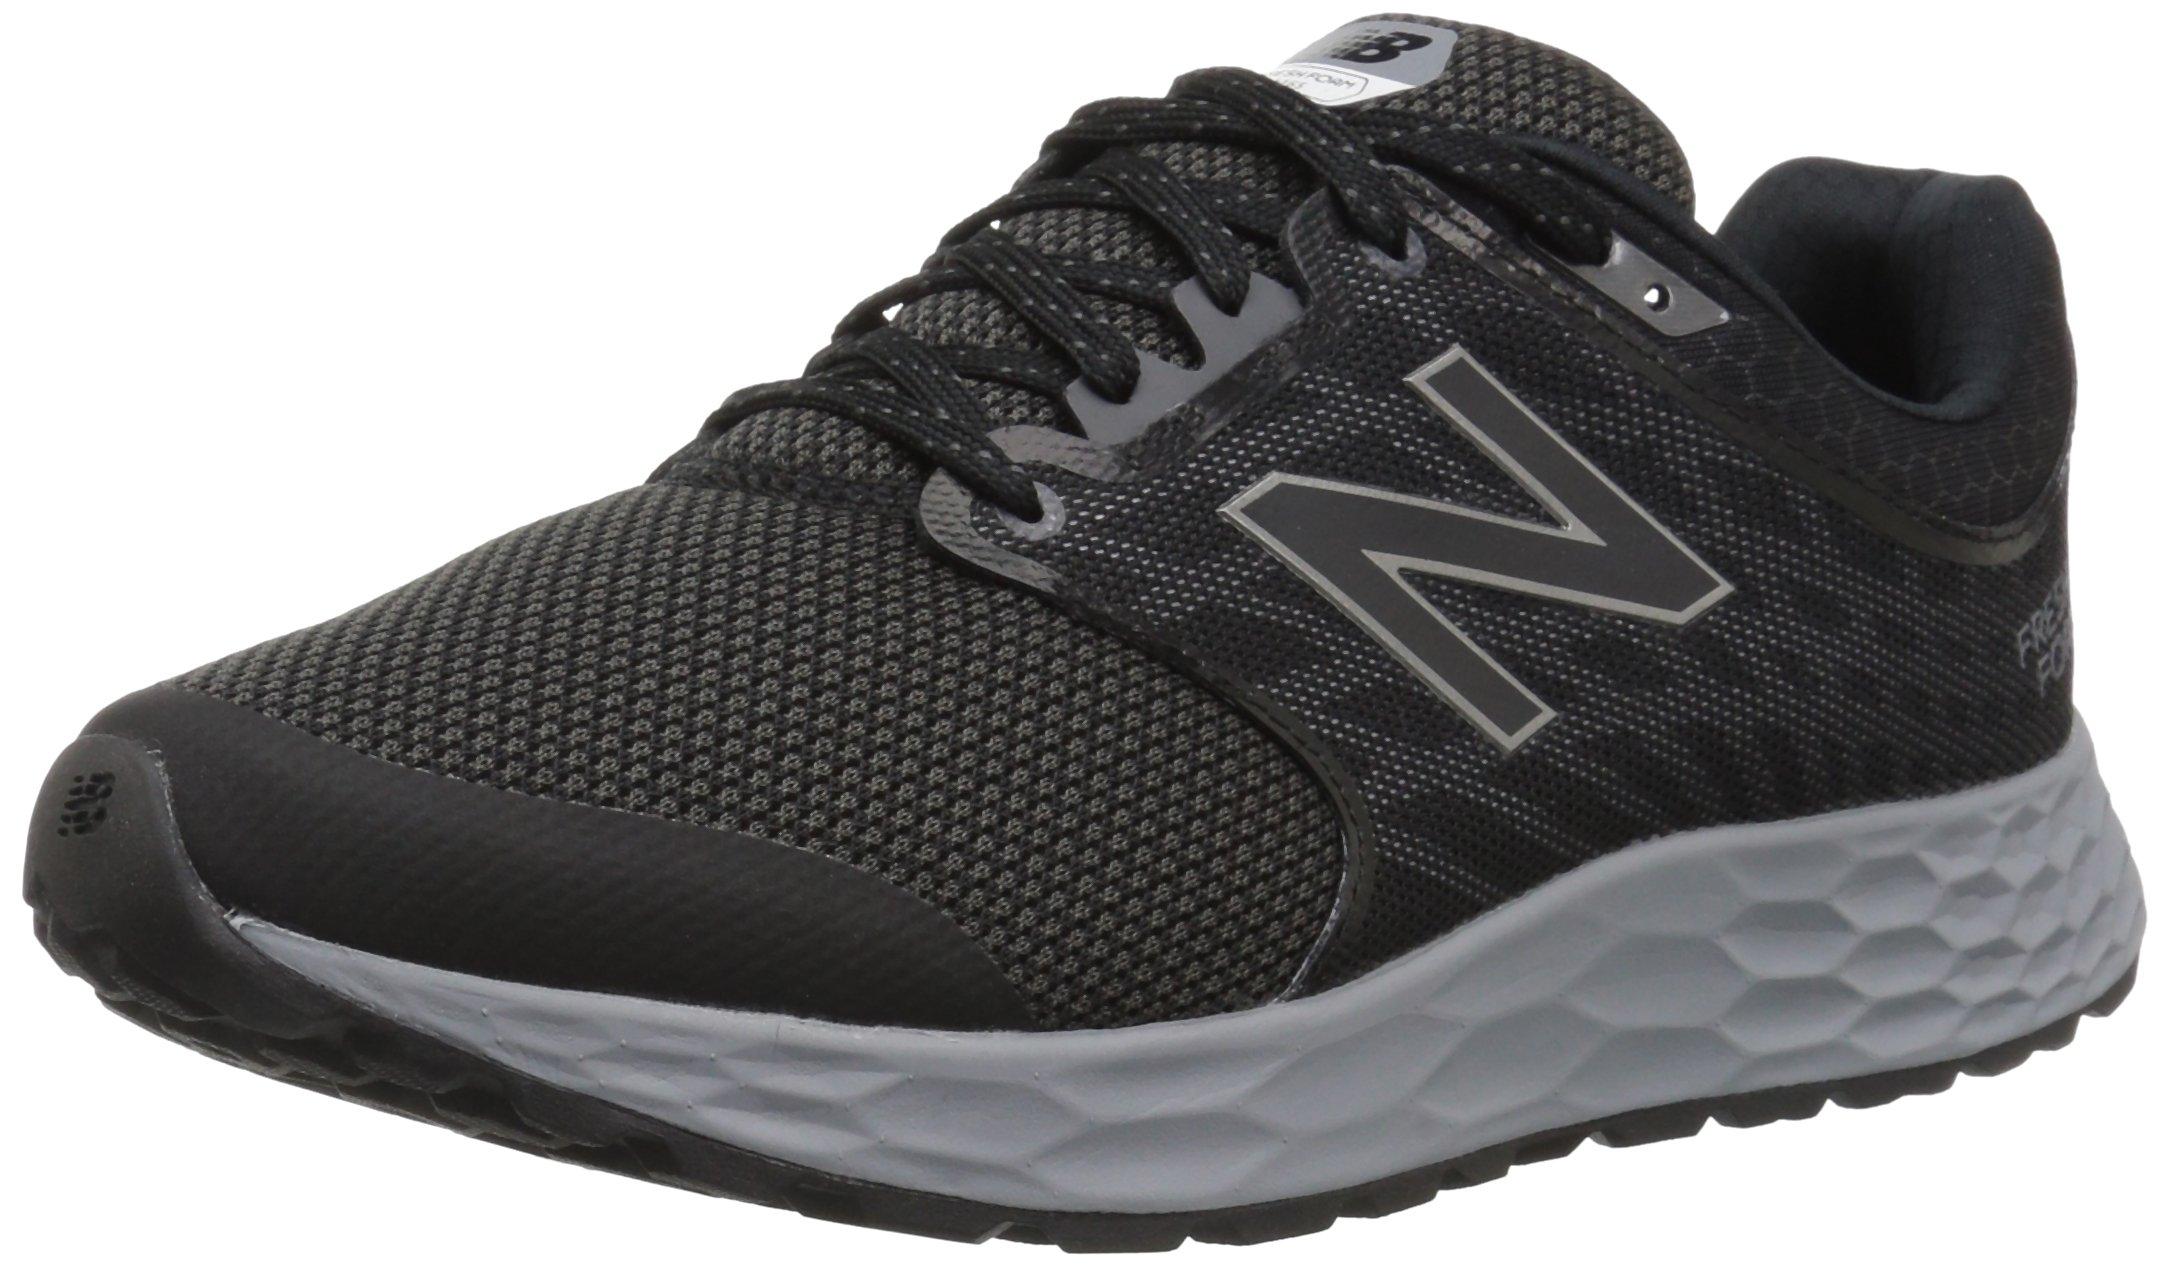 New Balance Men's 1165v1 Fresh Foam Walking Shoe, Black/Silver, 12 2E US by New Balance